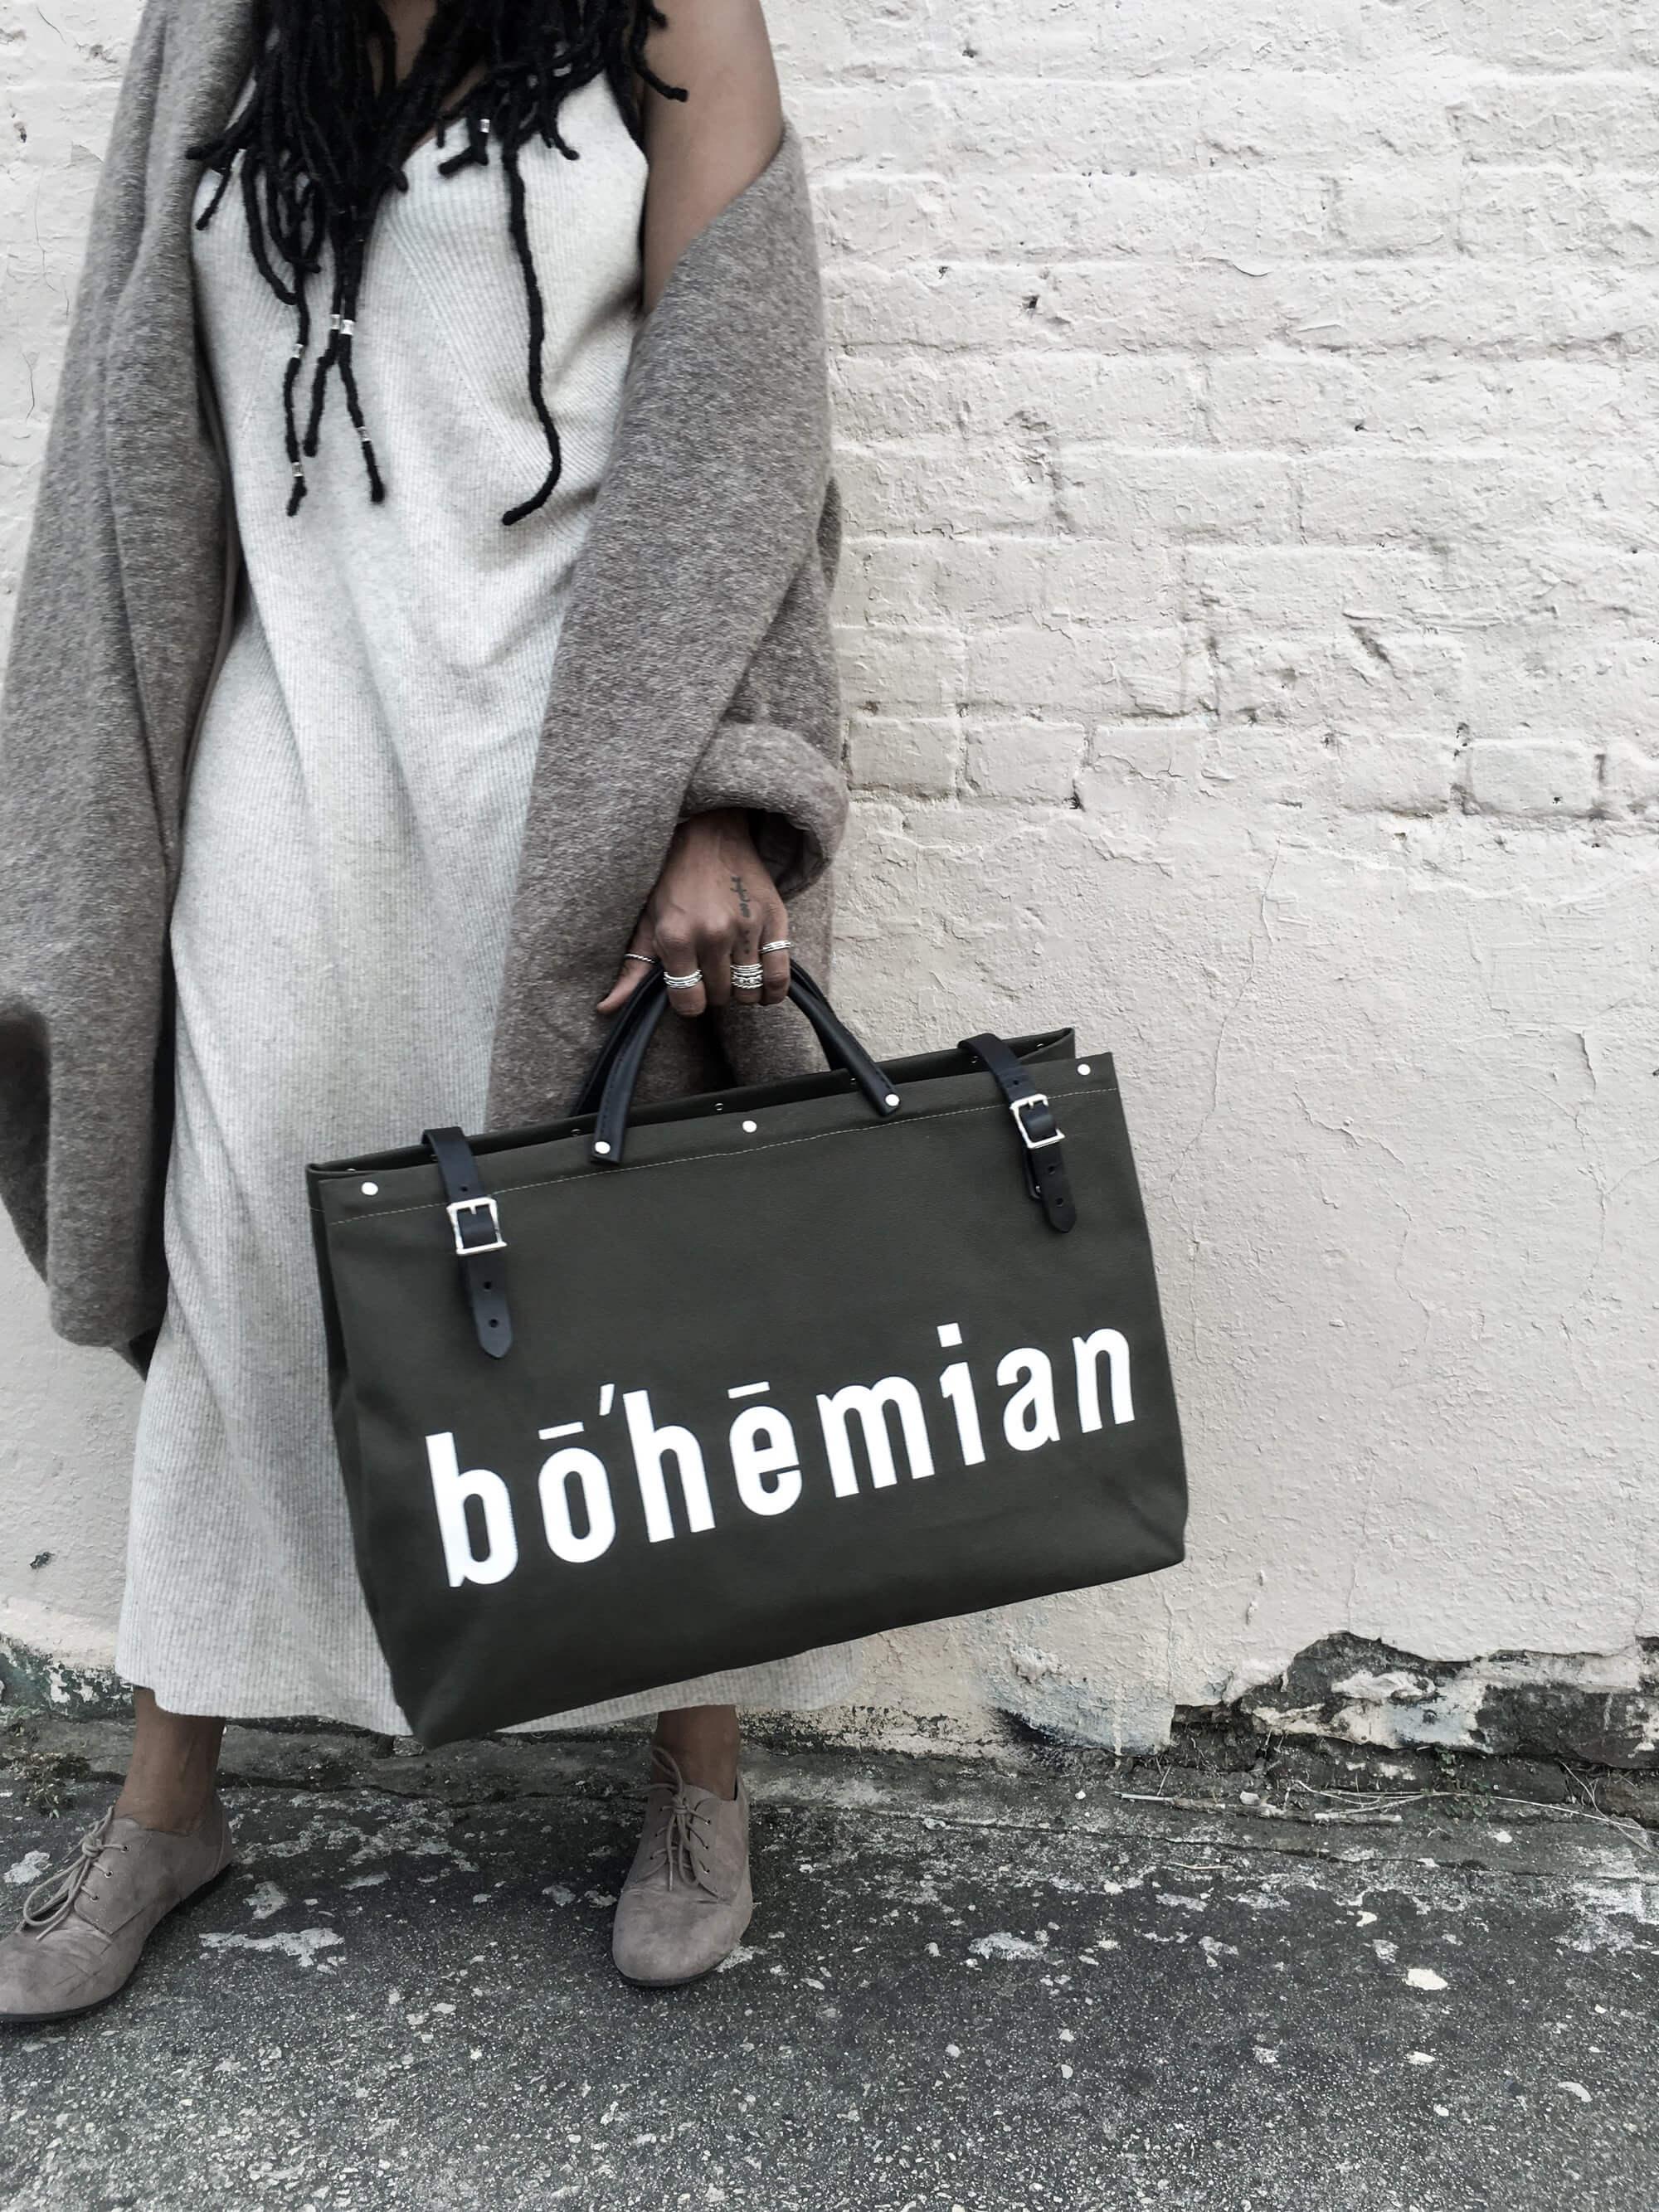 Picture: Souk Bohemian Travel Bag